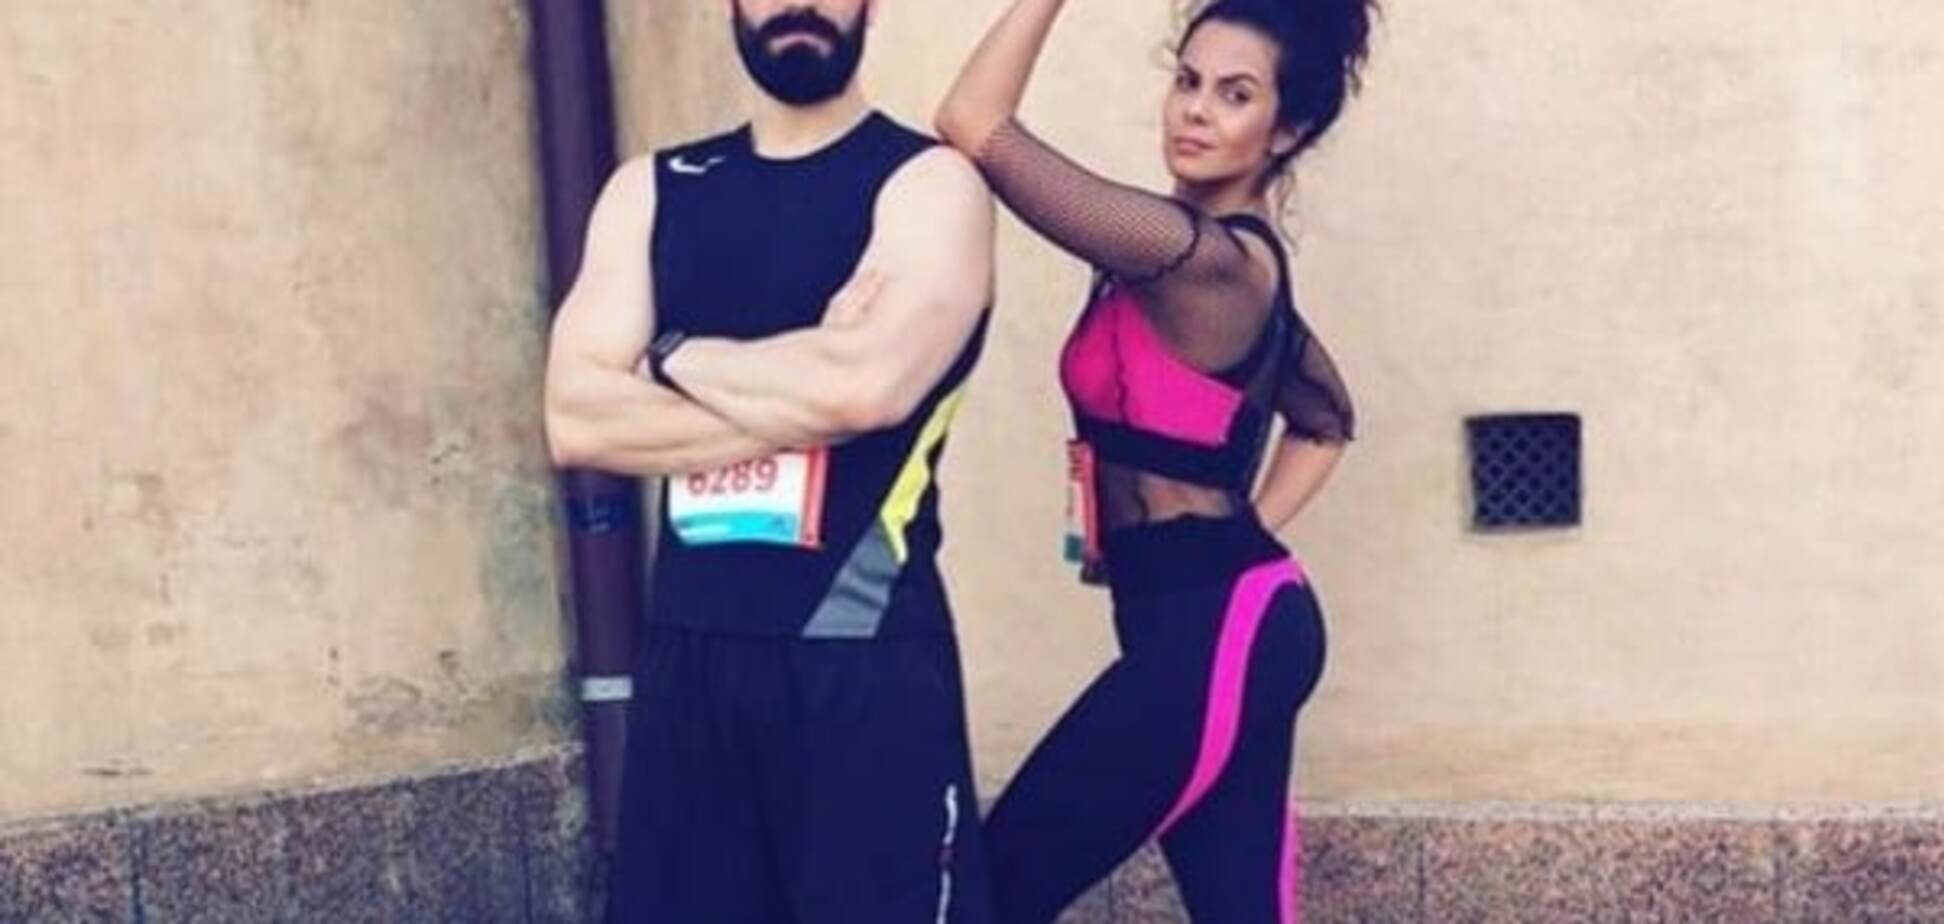 Настя Каменских пробежала марафон